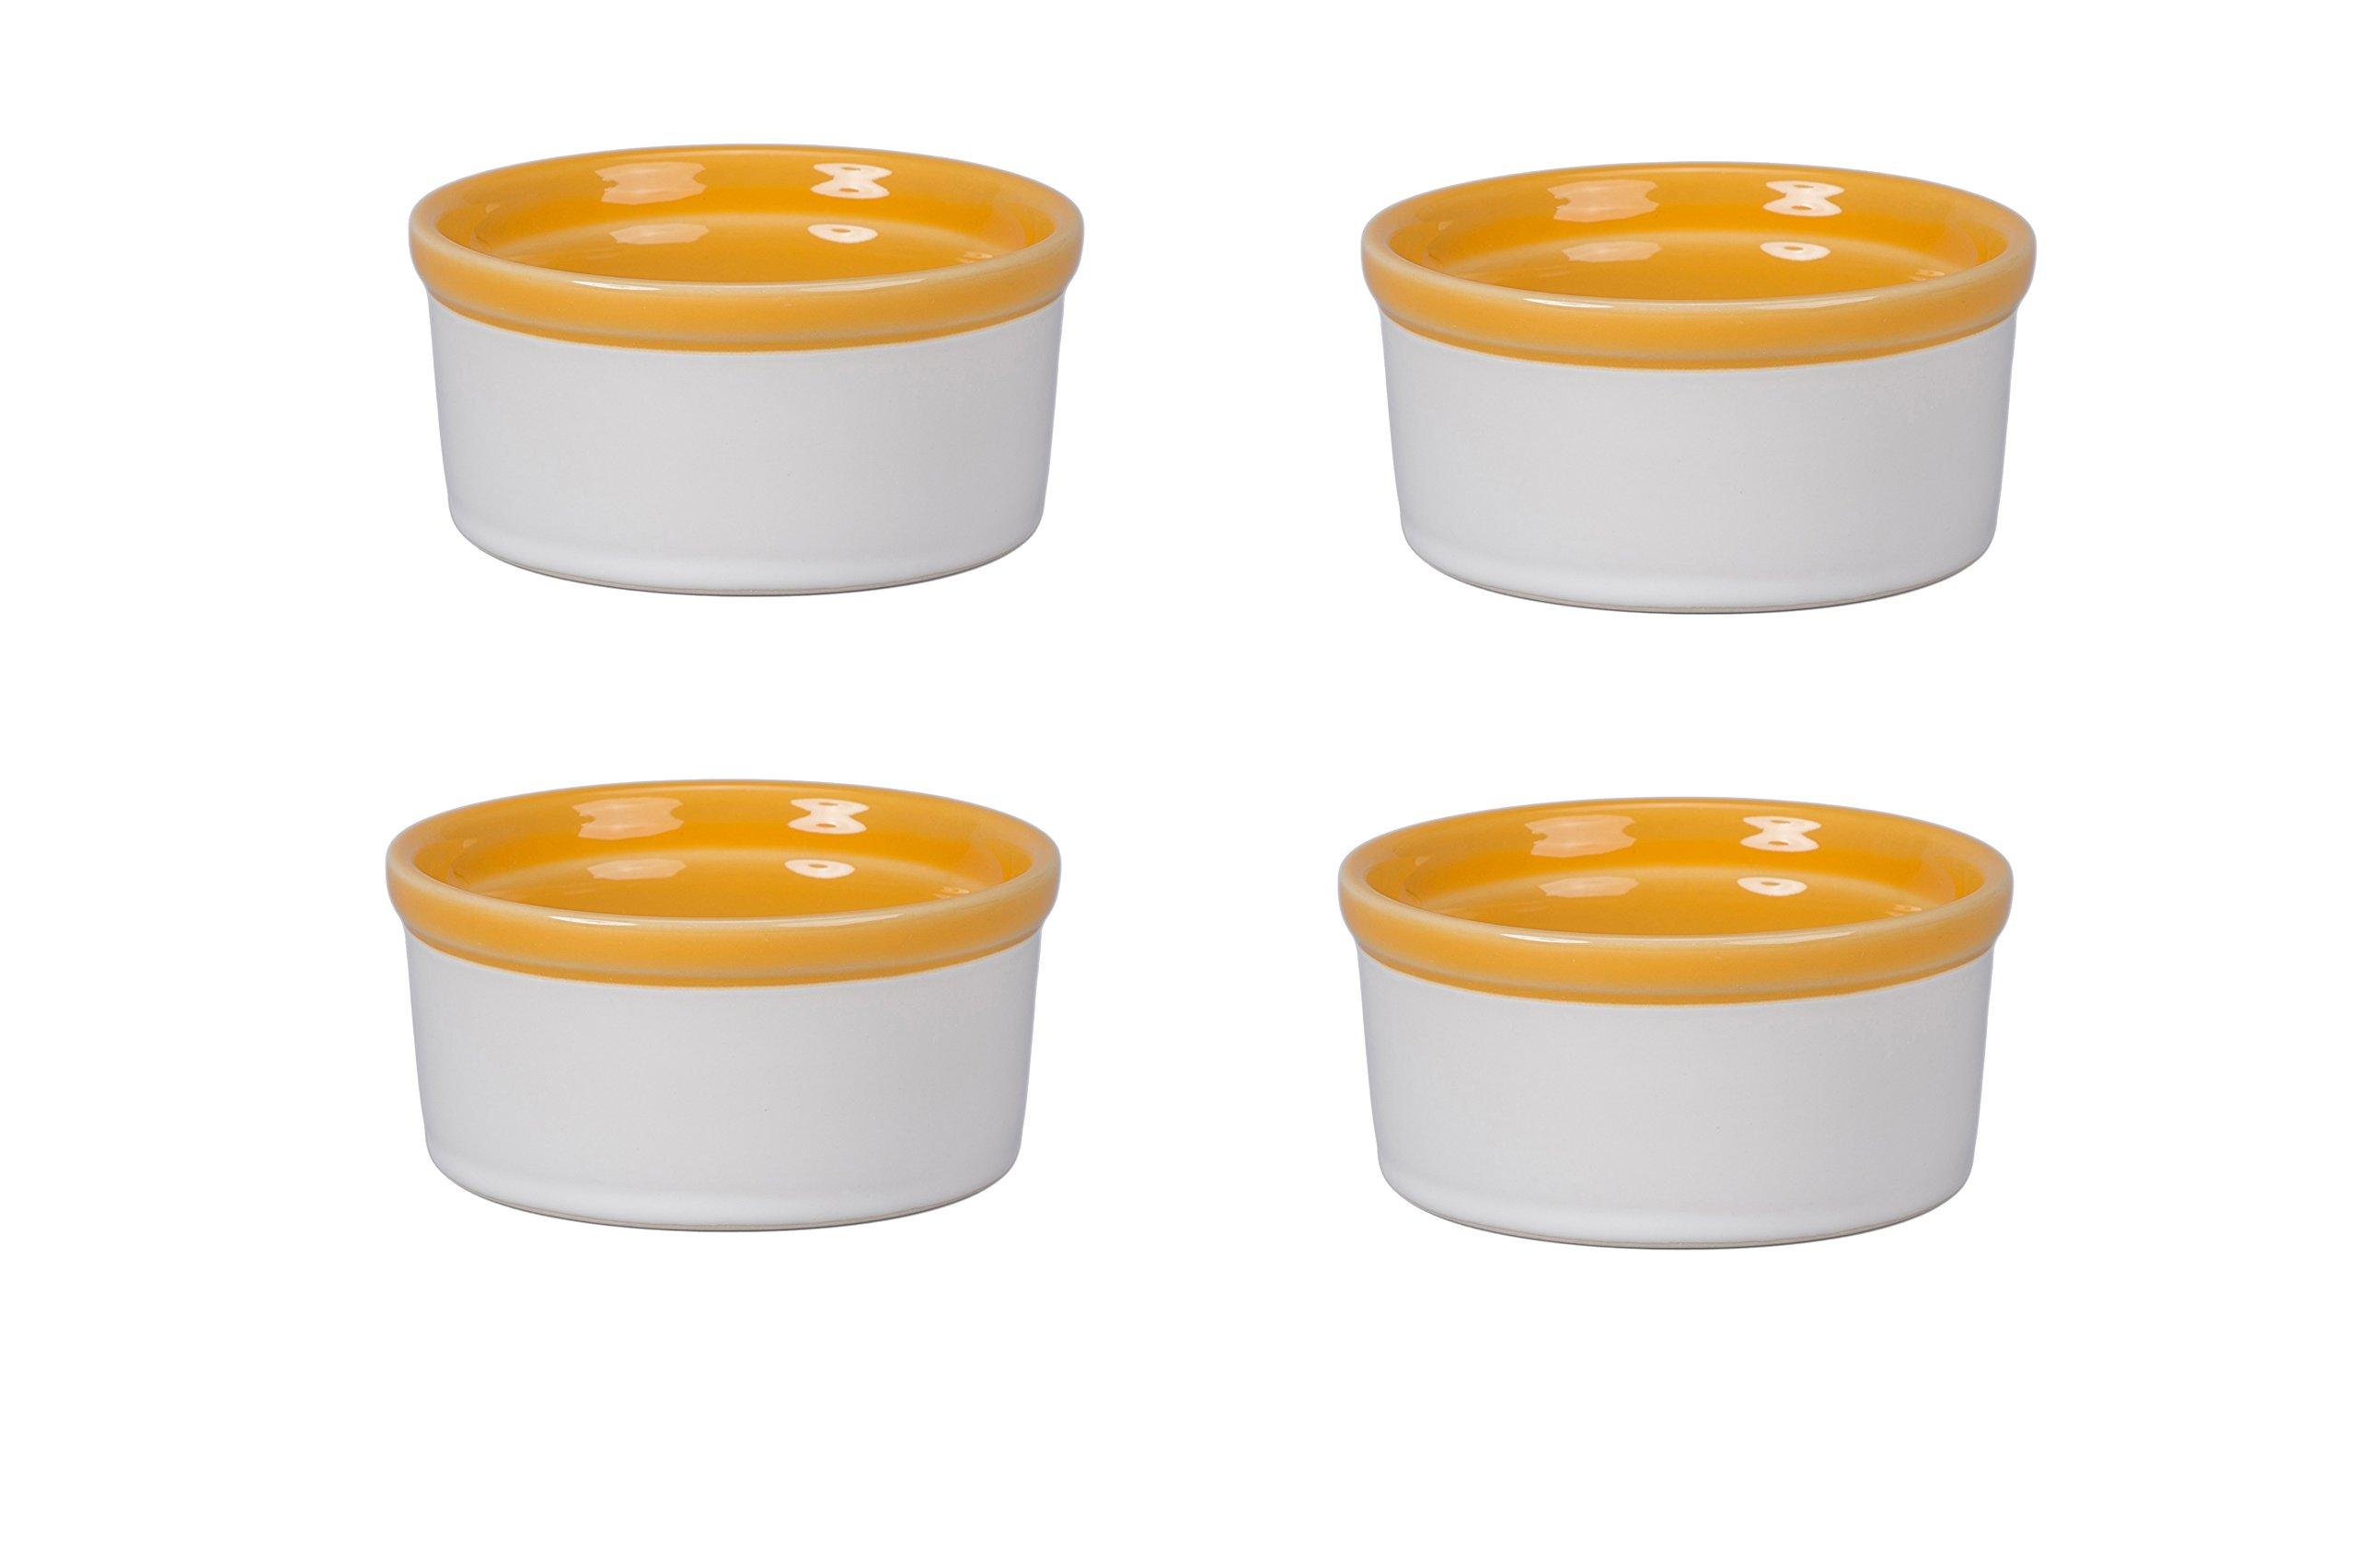 BIA Cordon Bleu 404991+3095S4SIOC Individual Dish Souffle, Yellow/White